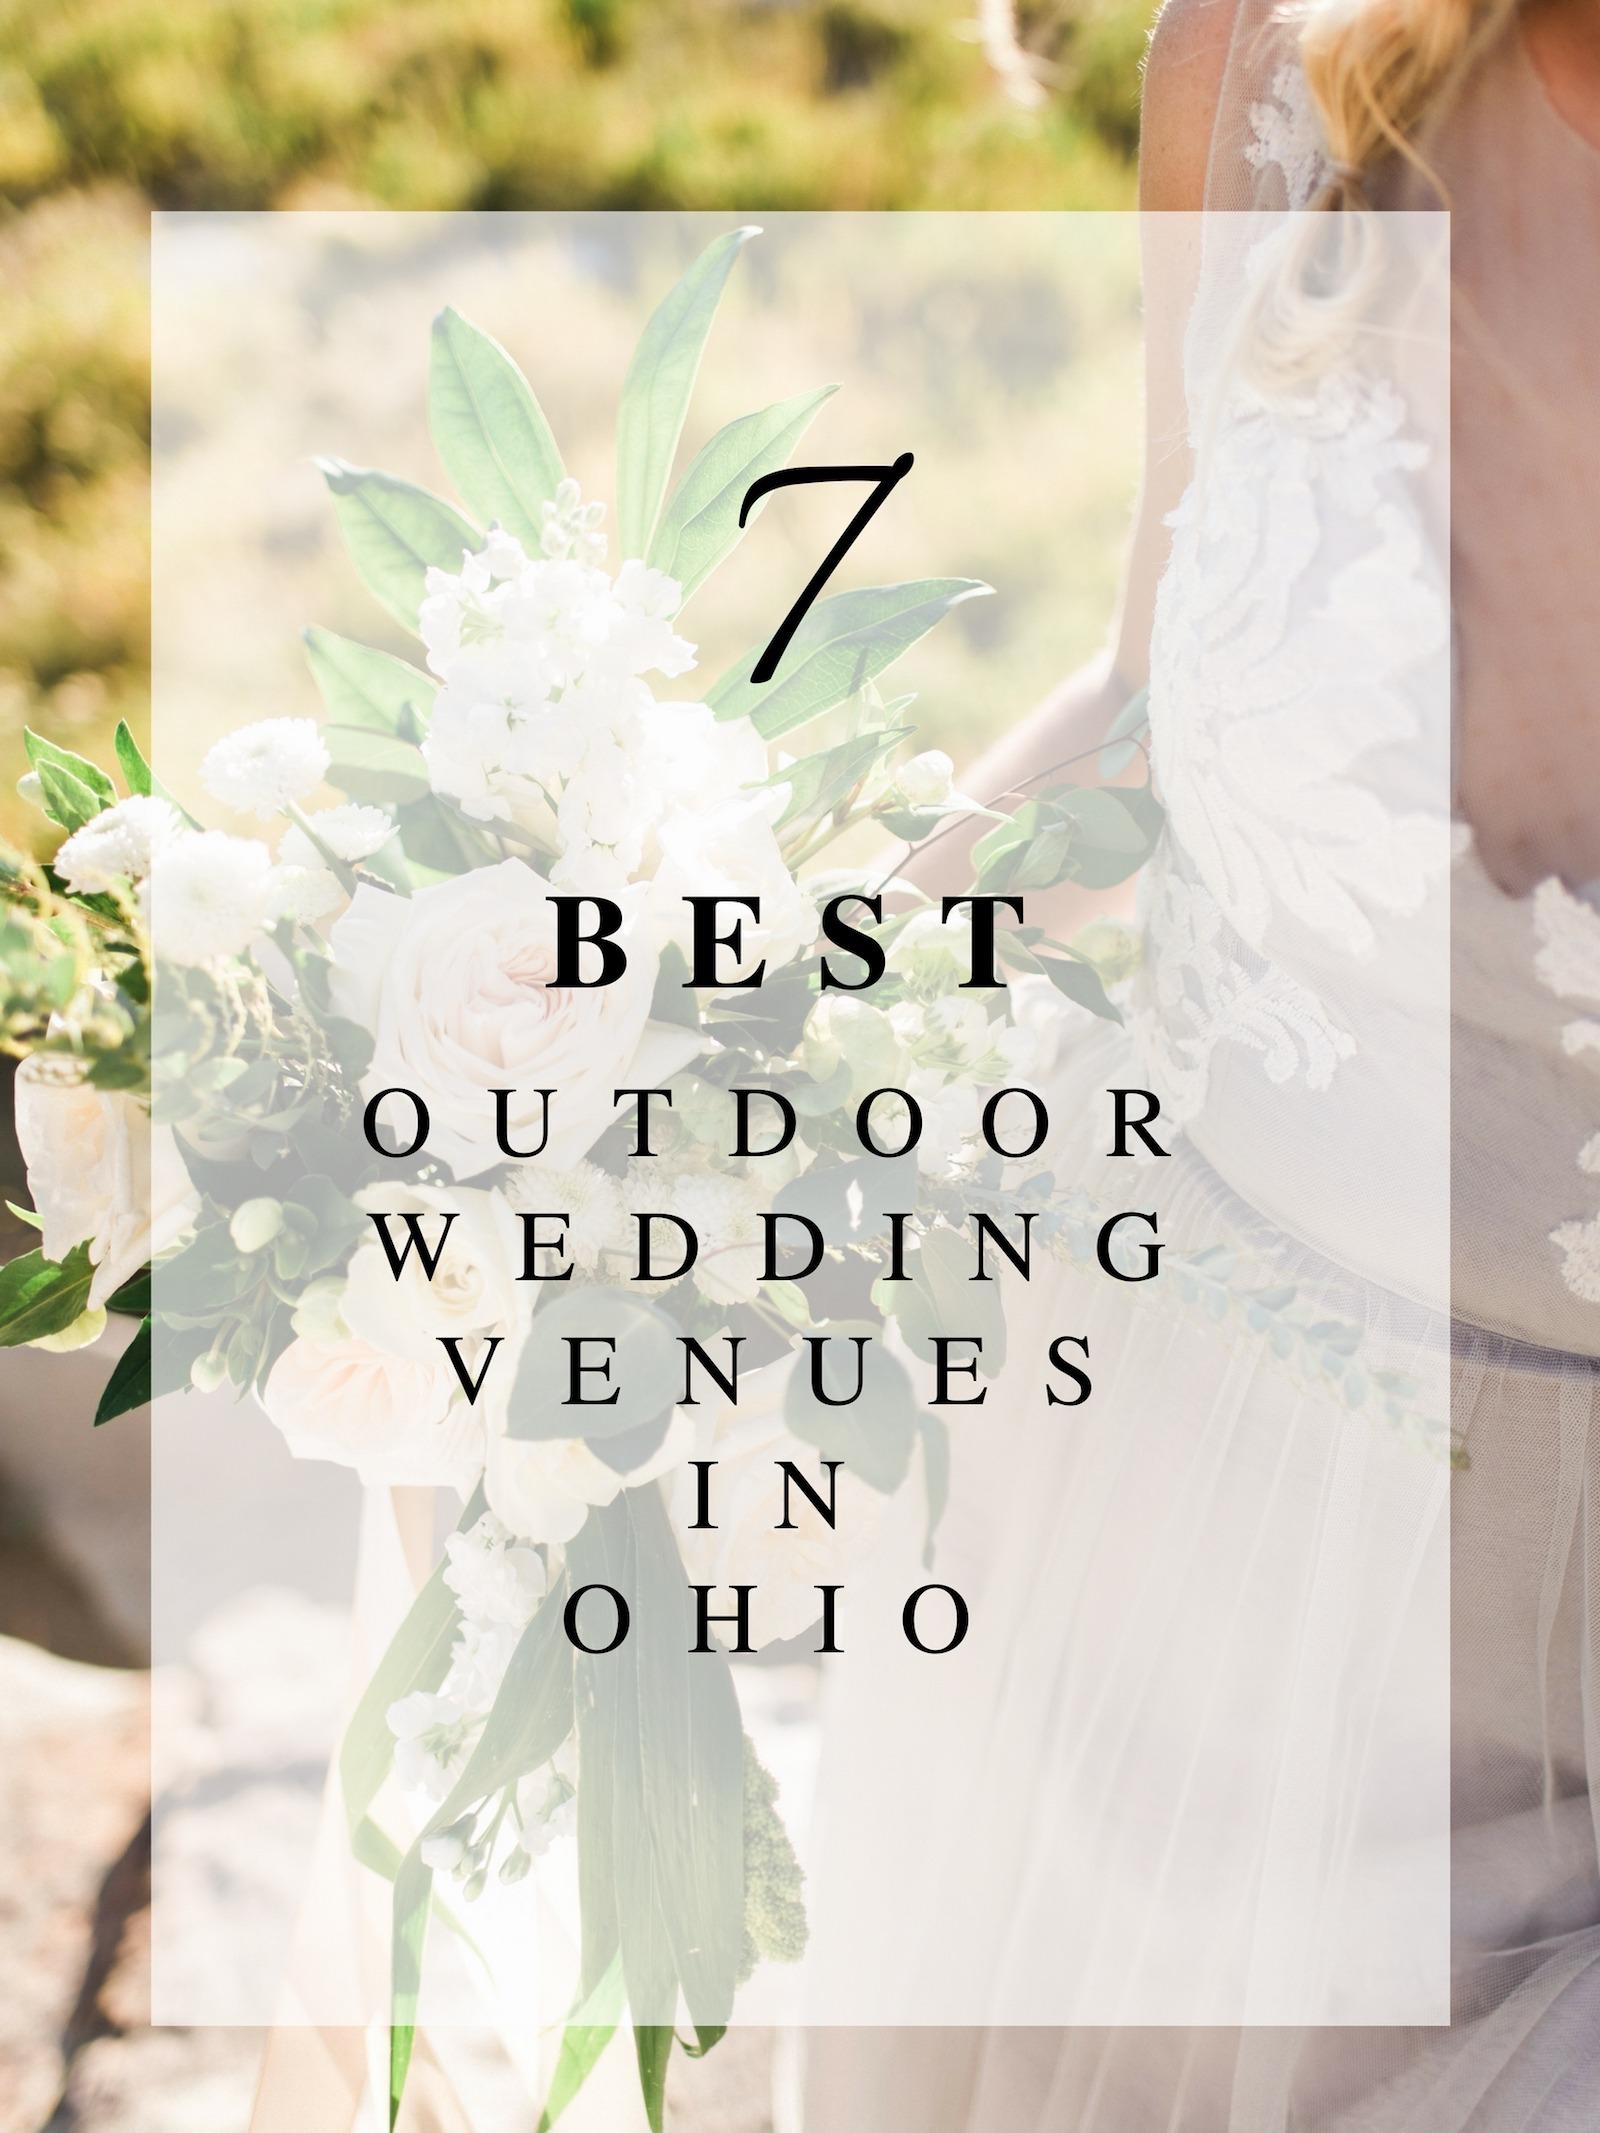 7 Best Outdoor Wedding Venues in Ohio - Roots Floral Design